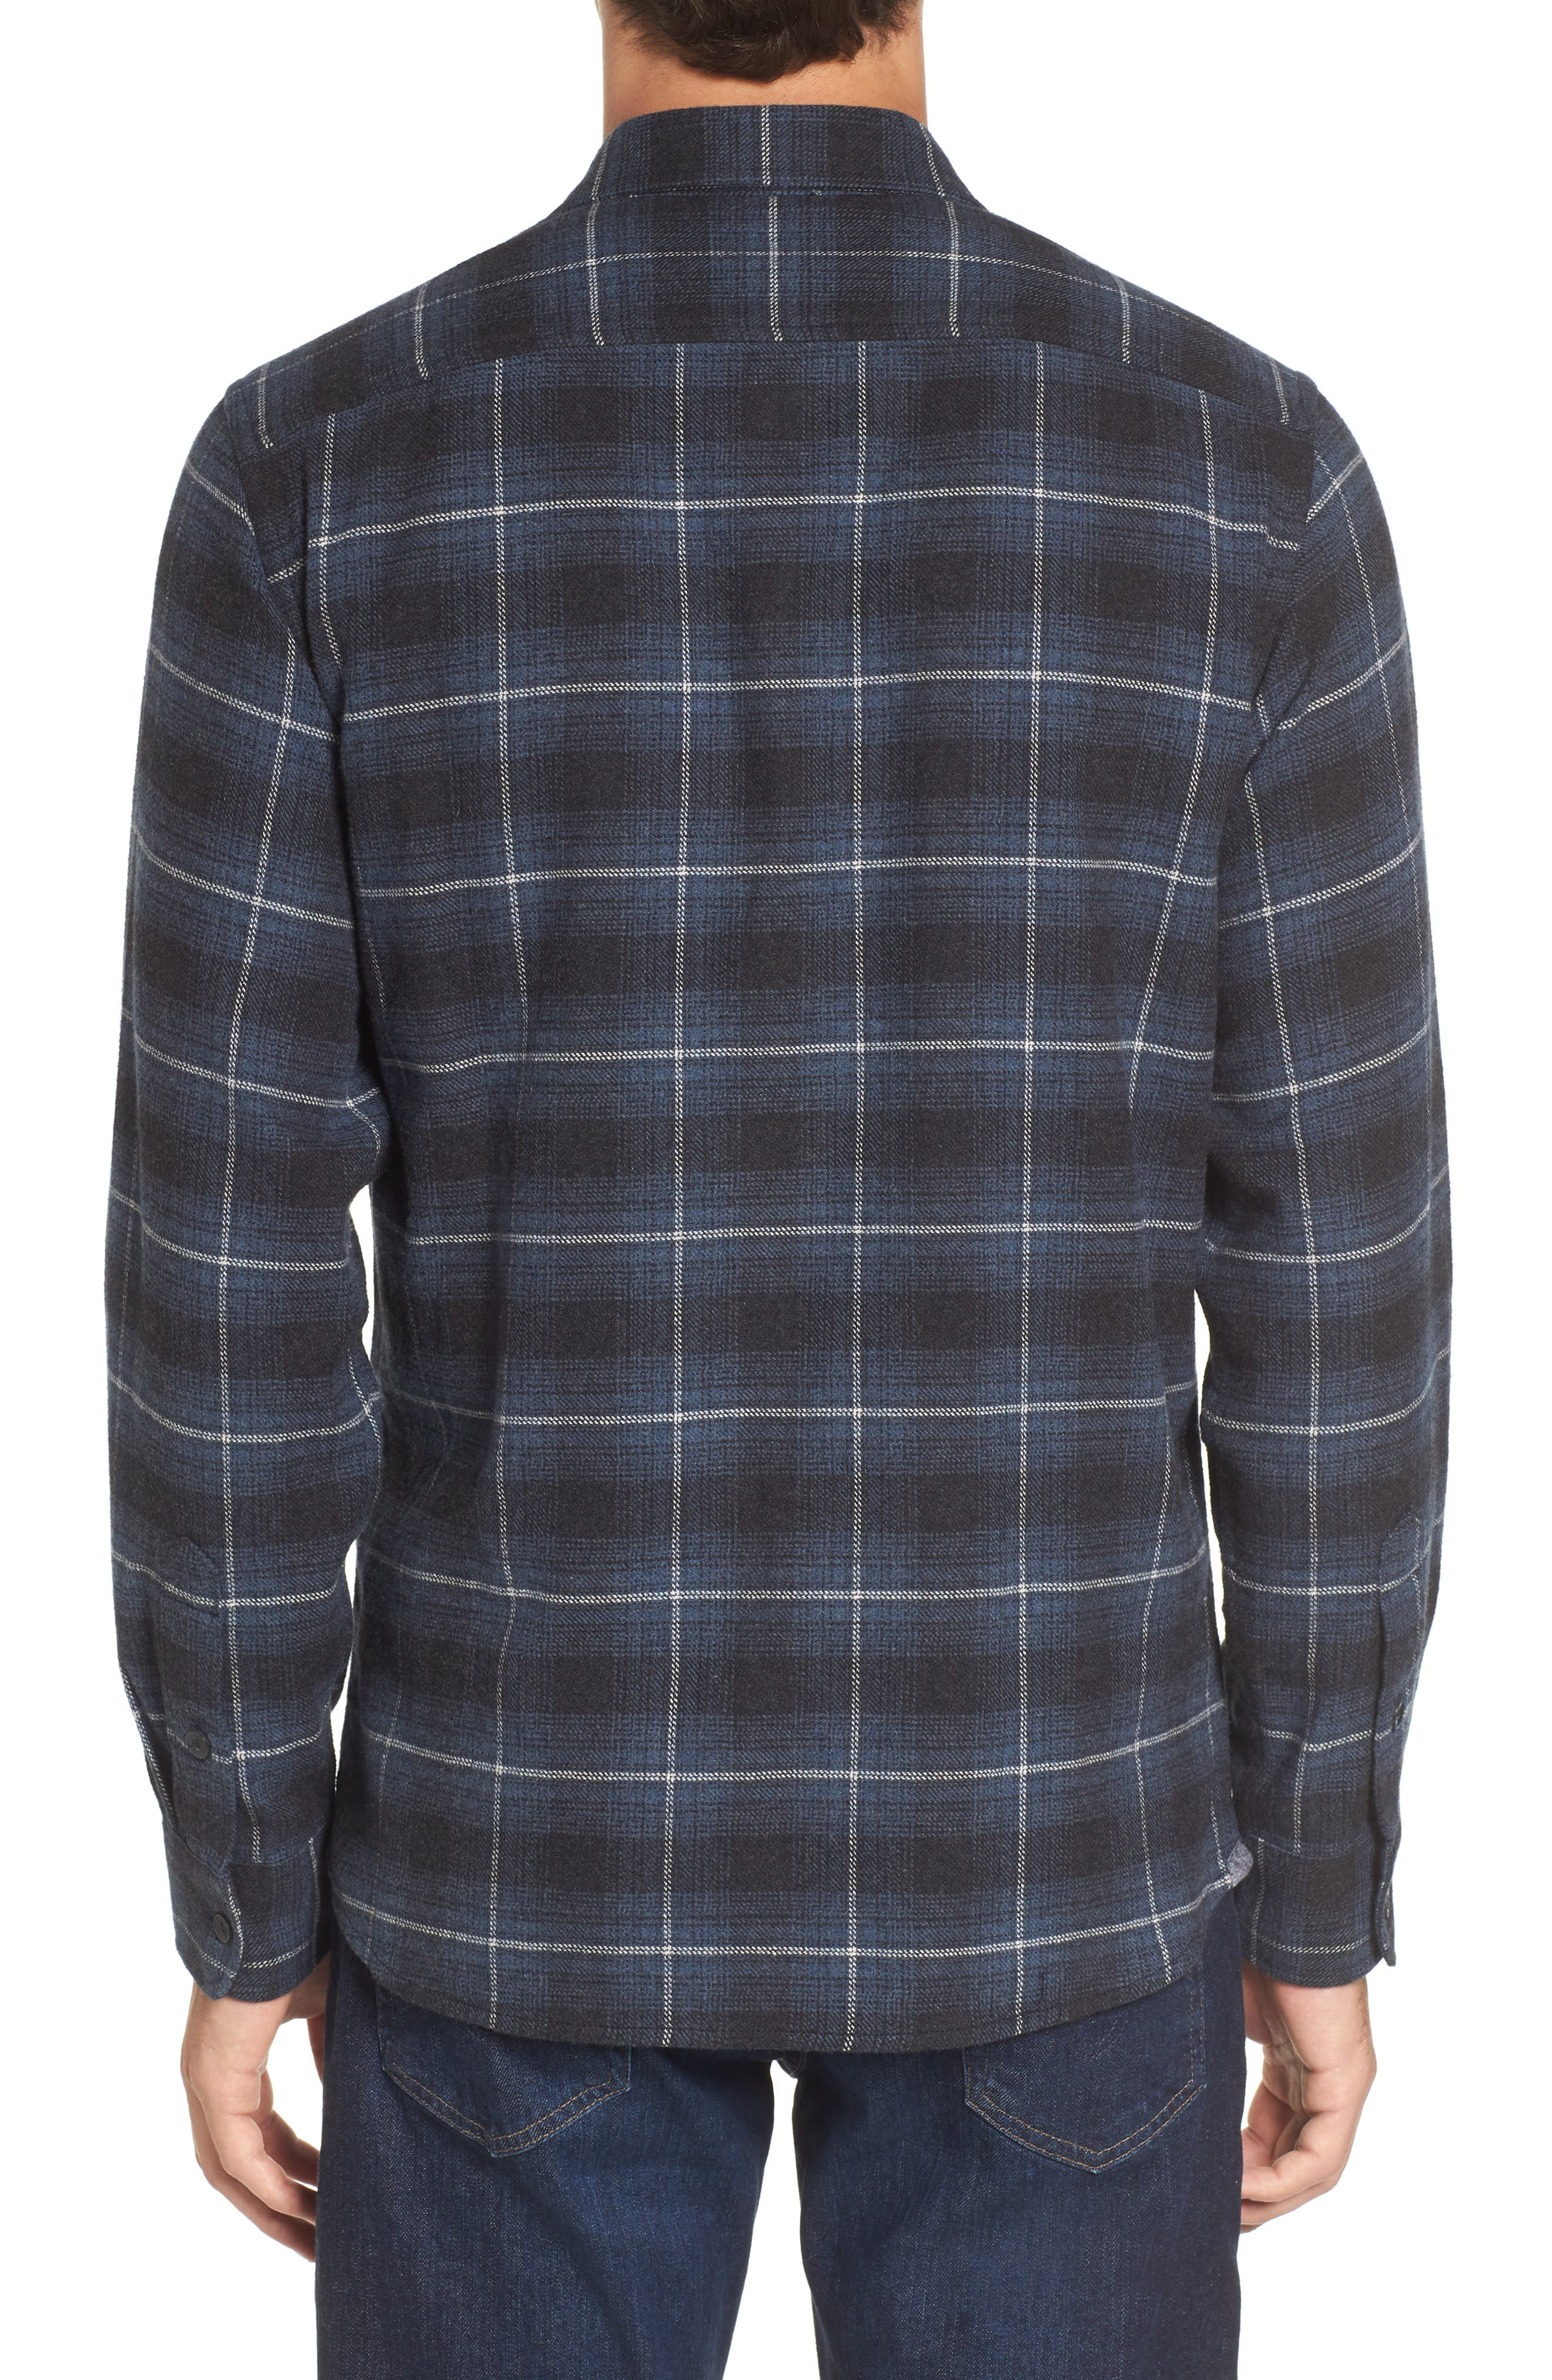 Clarke Heritage Flannel Shirt,                             Alternate thumbnail 2, color,                             Blue Charcoal